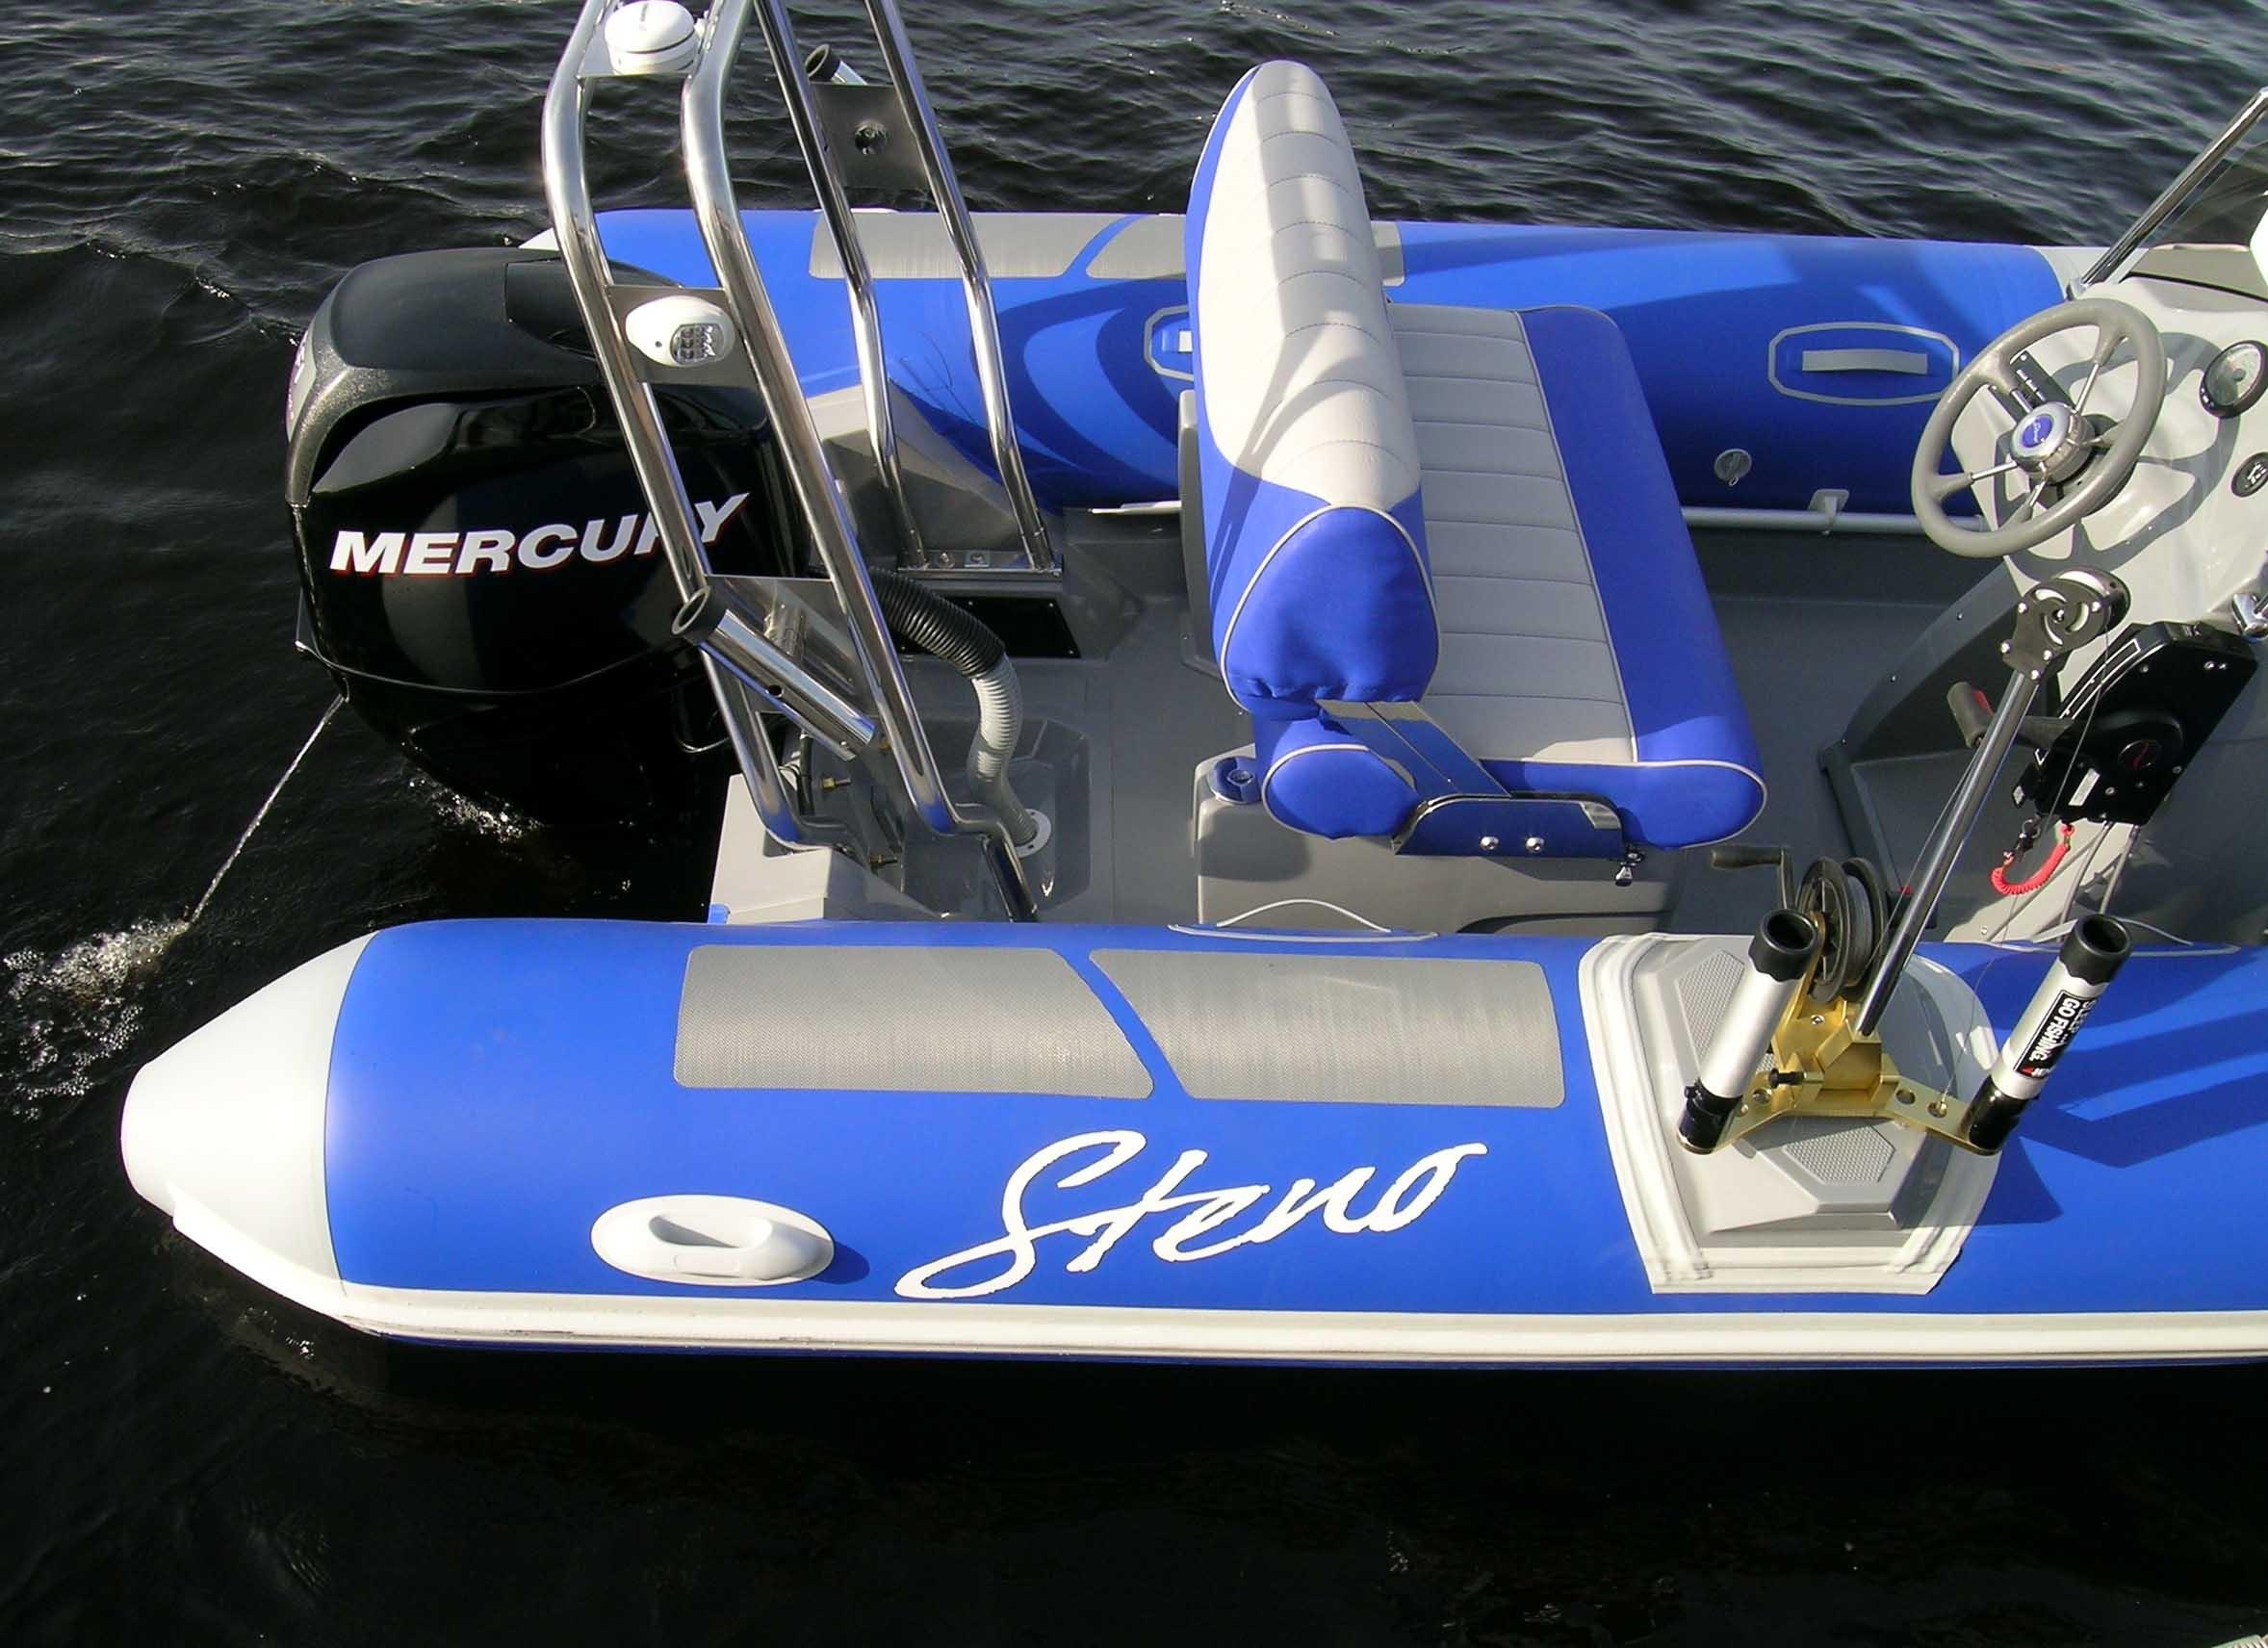 Универсальная надувная лодка Steno RIB 535